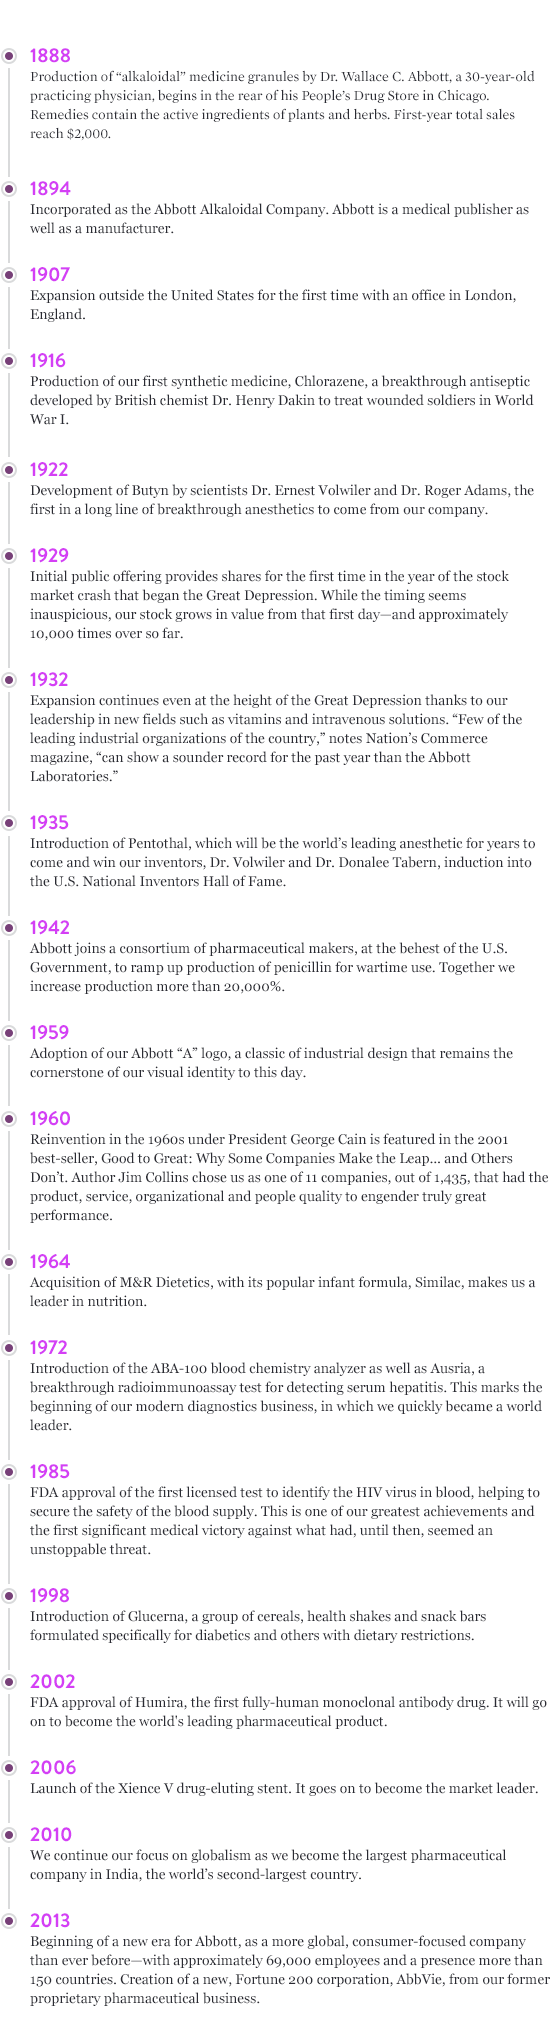 Abbott Heritage Timeline